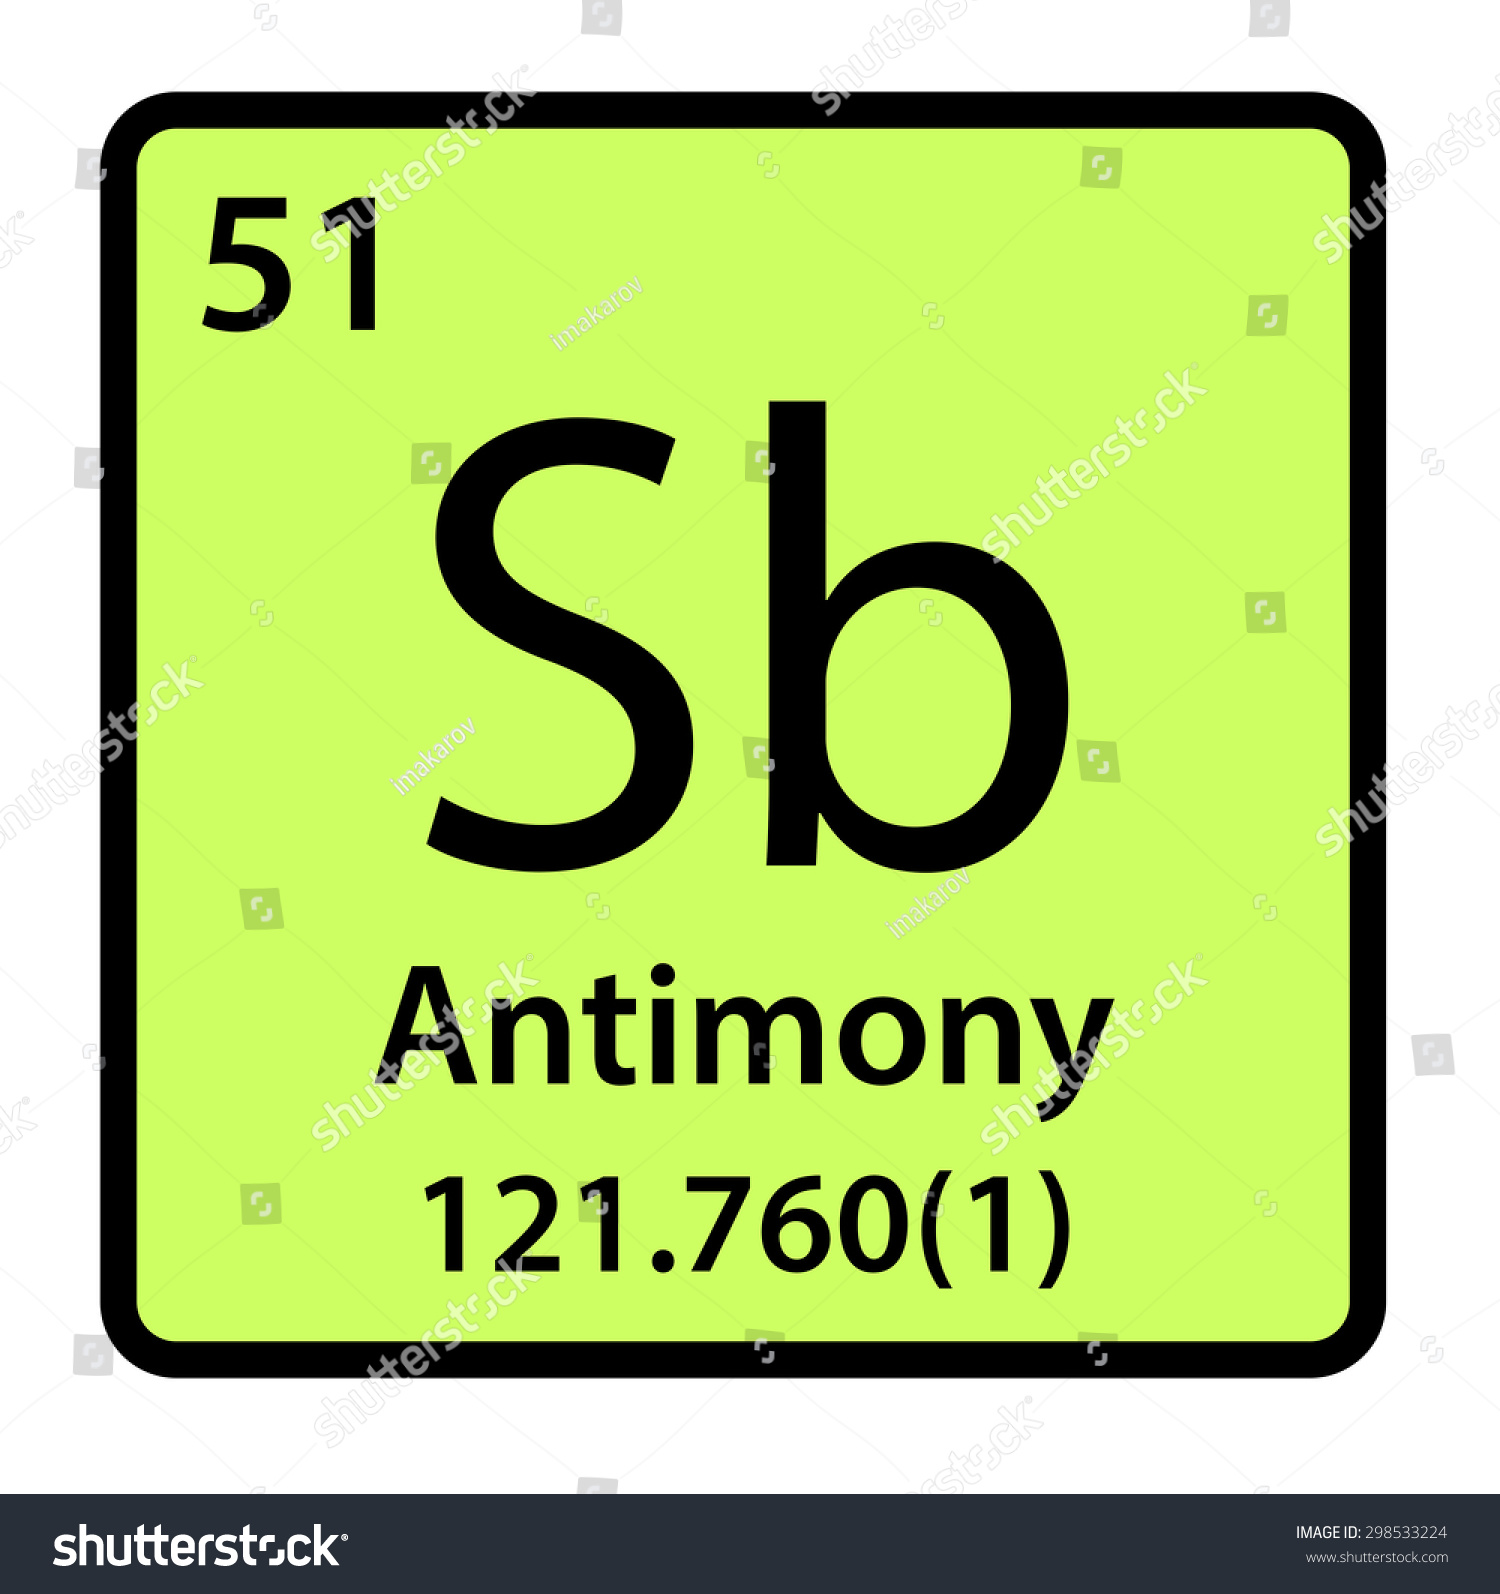 Element antimony periodic table stock illustration 298533224 element antimony of the periodic table gamestrikefo Choice Image